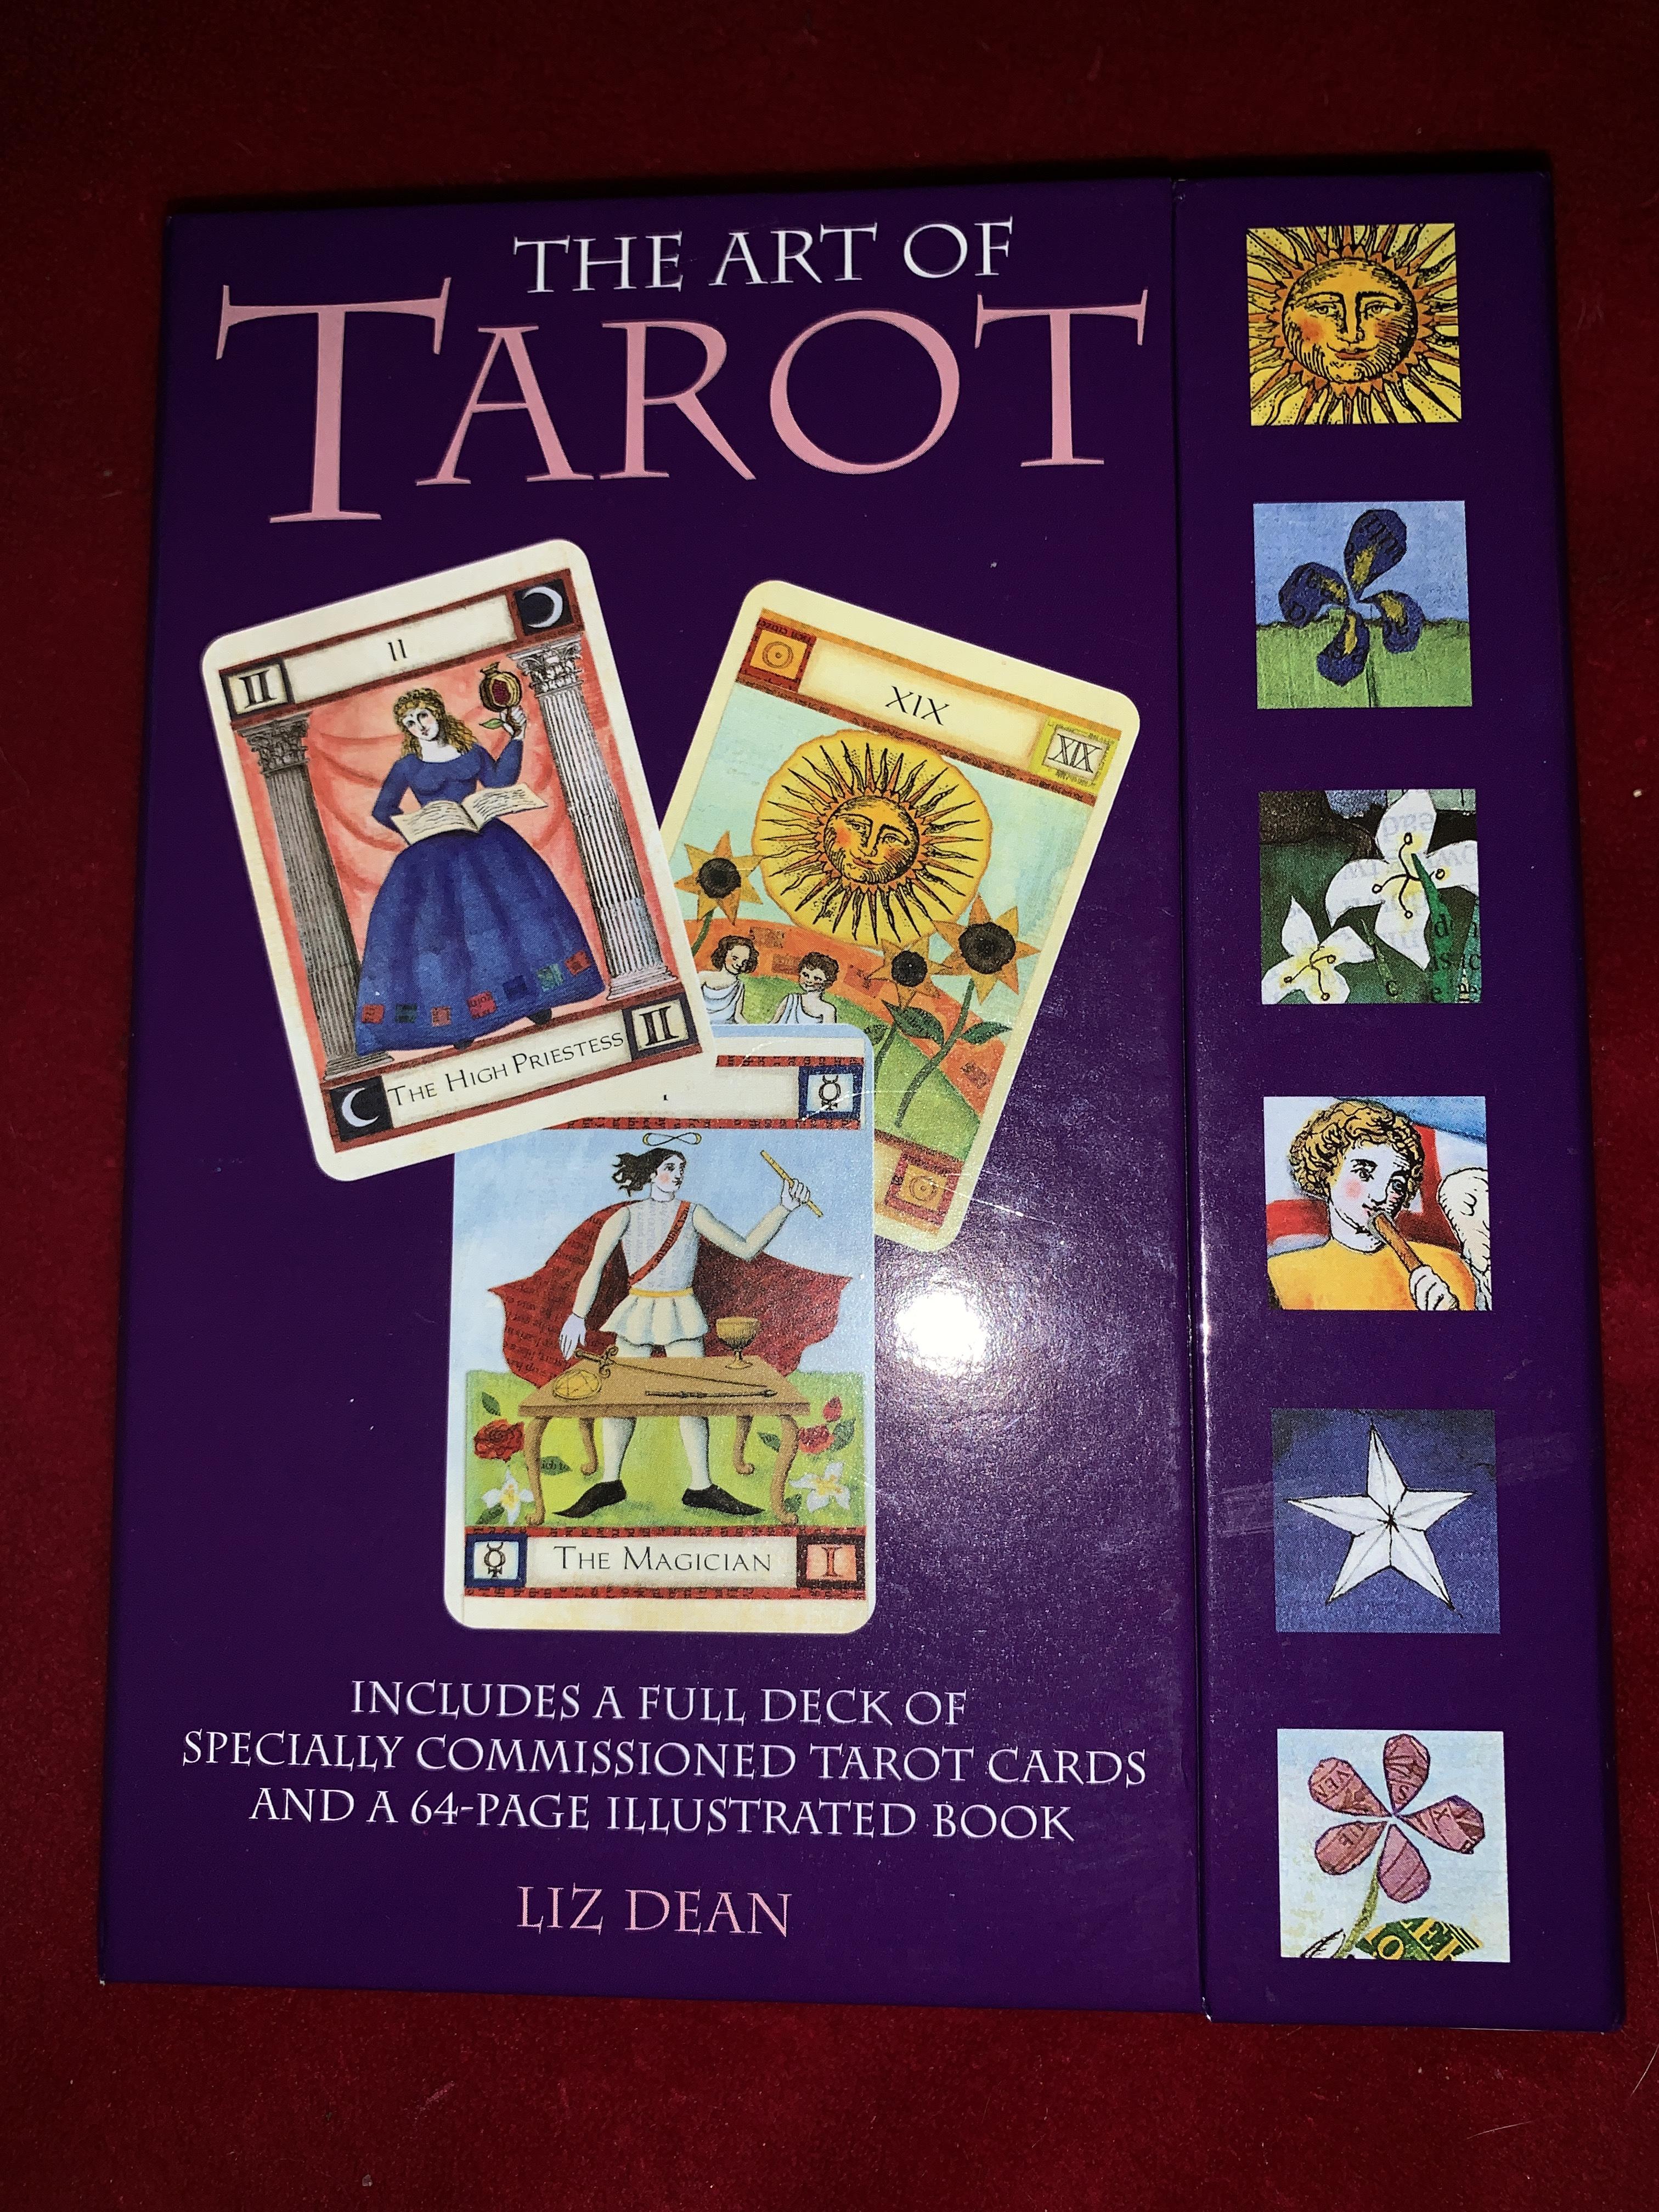 The Art of Tarot